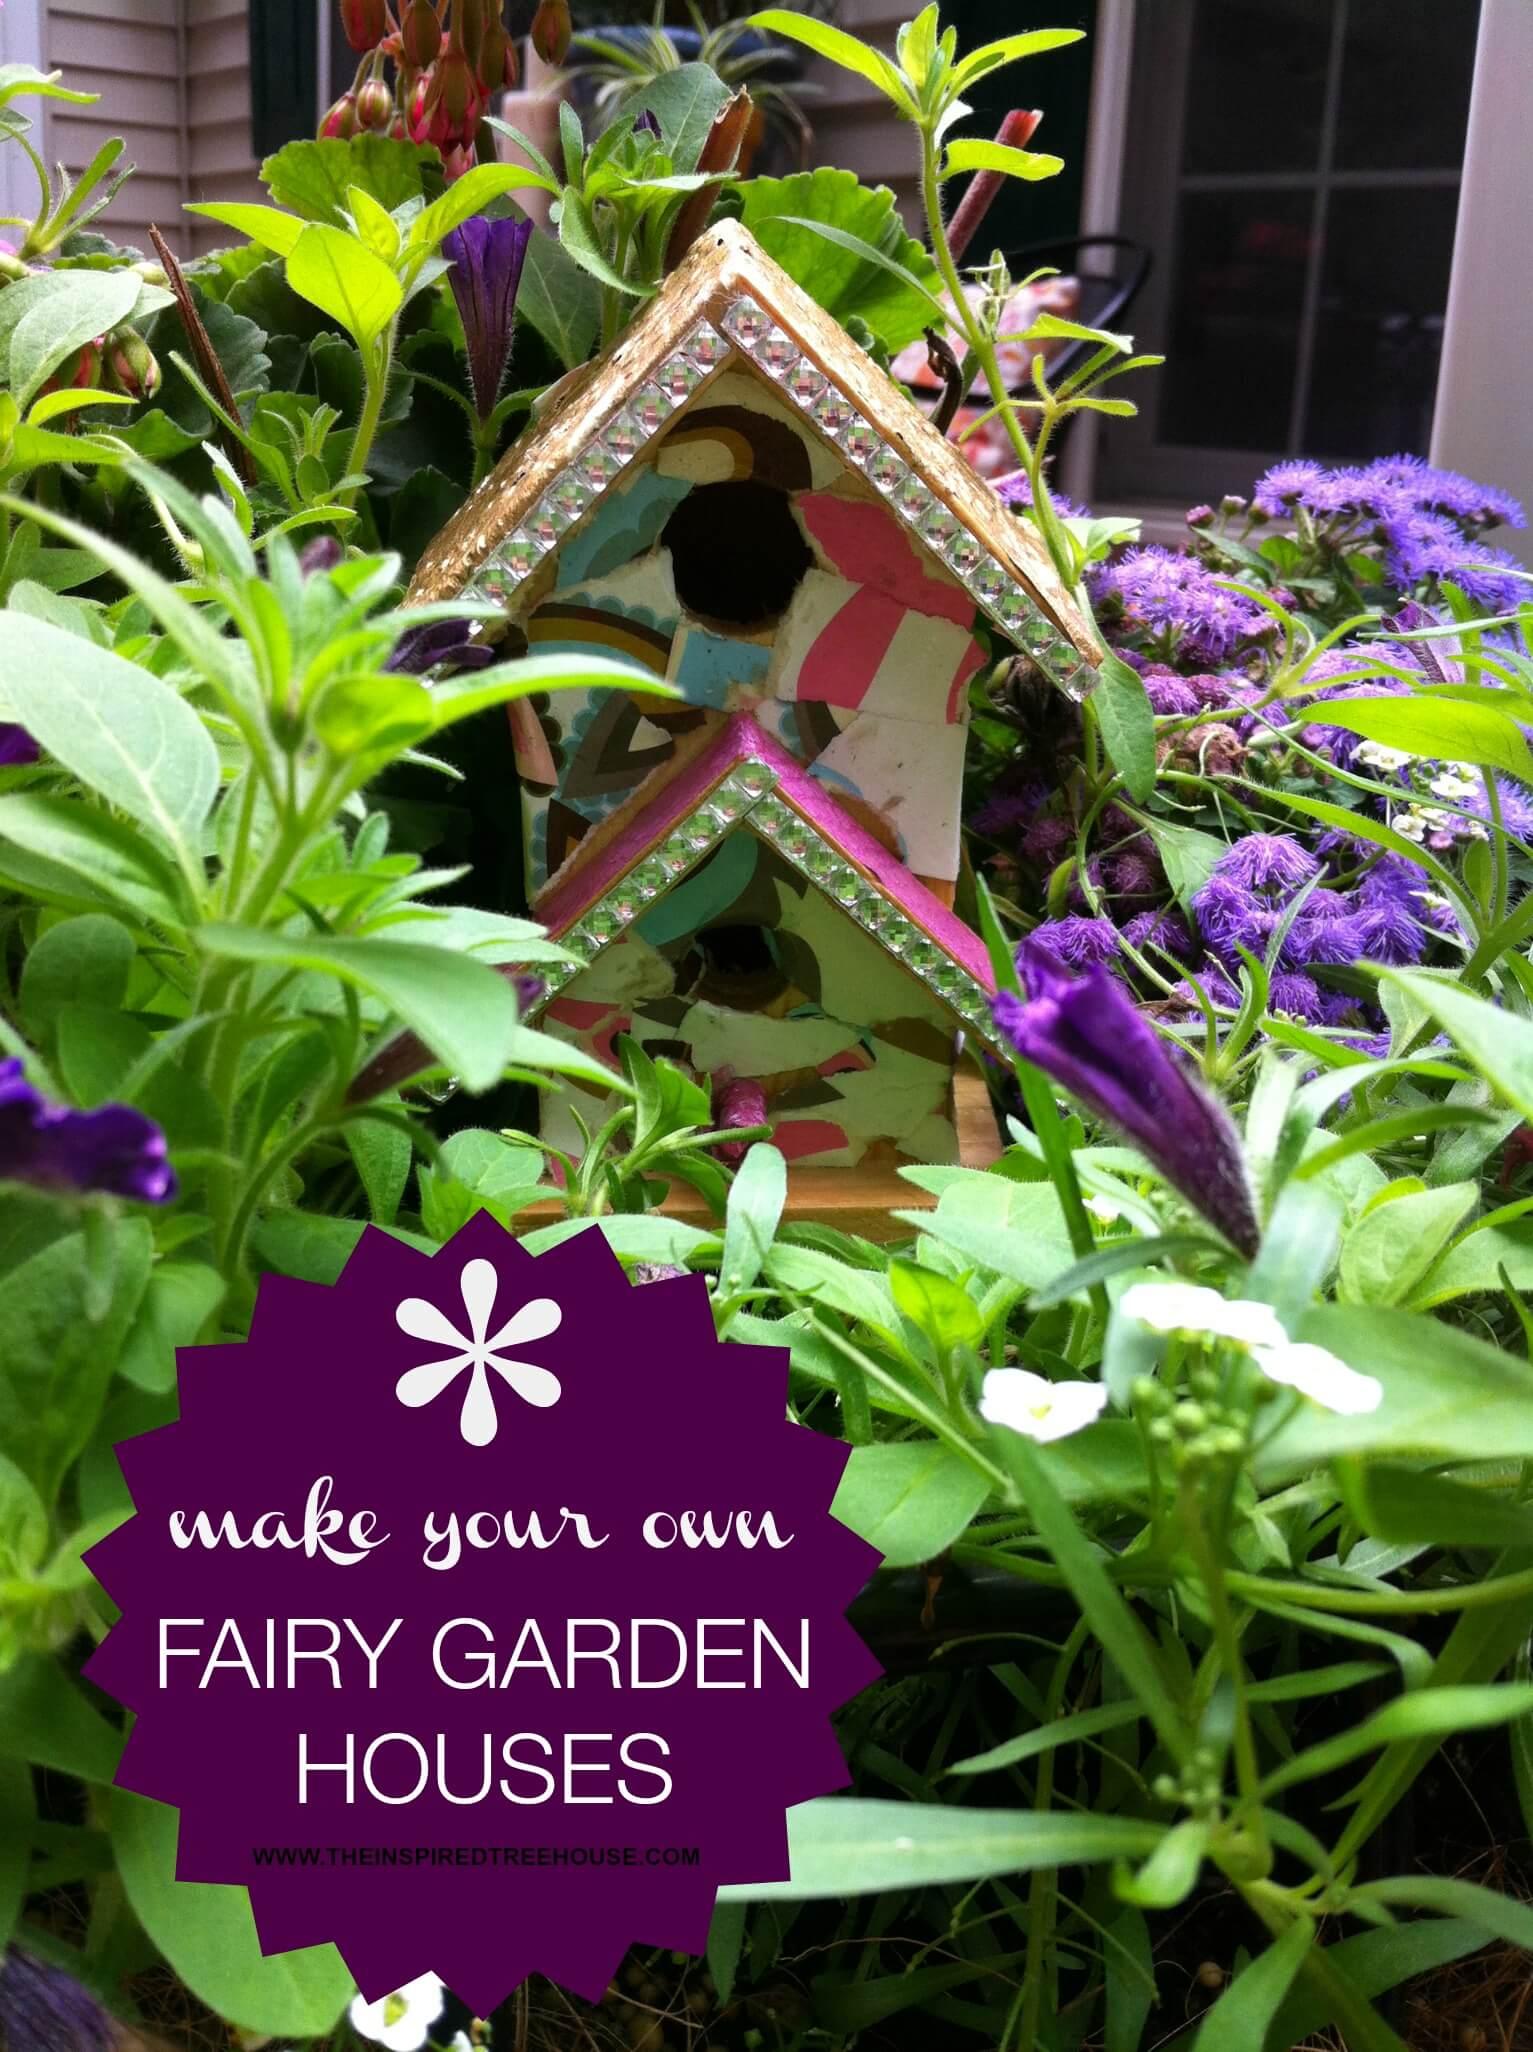 fairygardencollage2 - Fairy Garden Houses